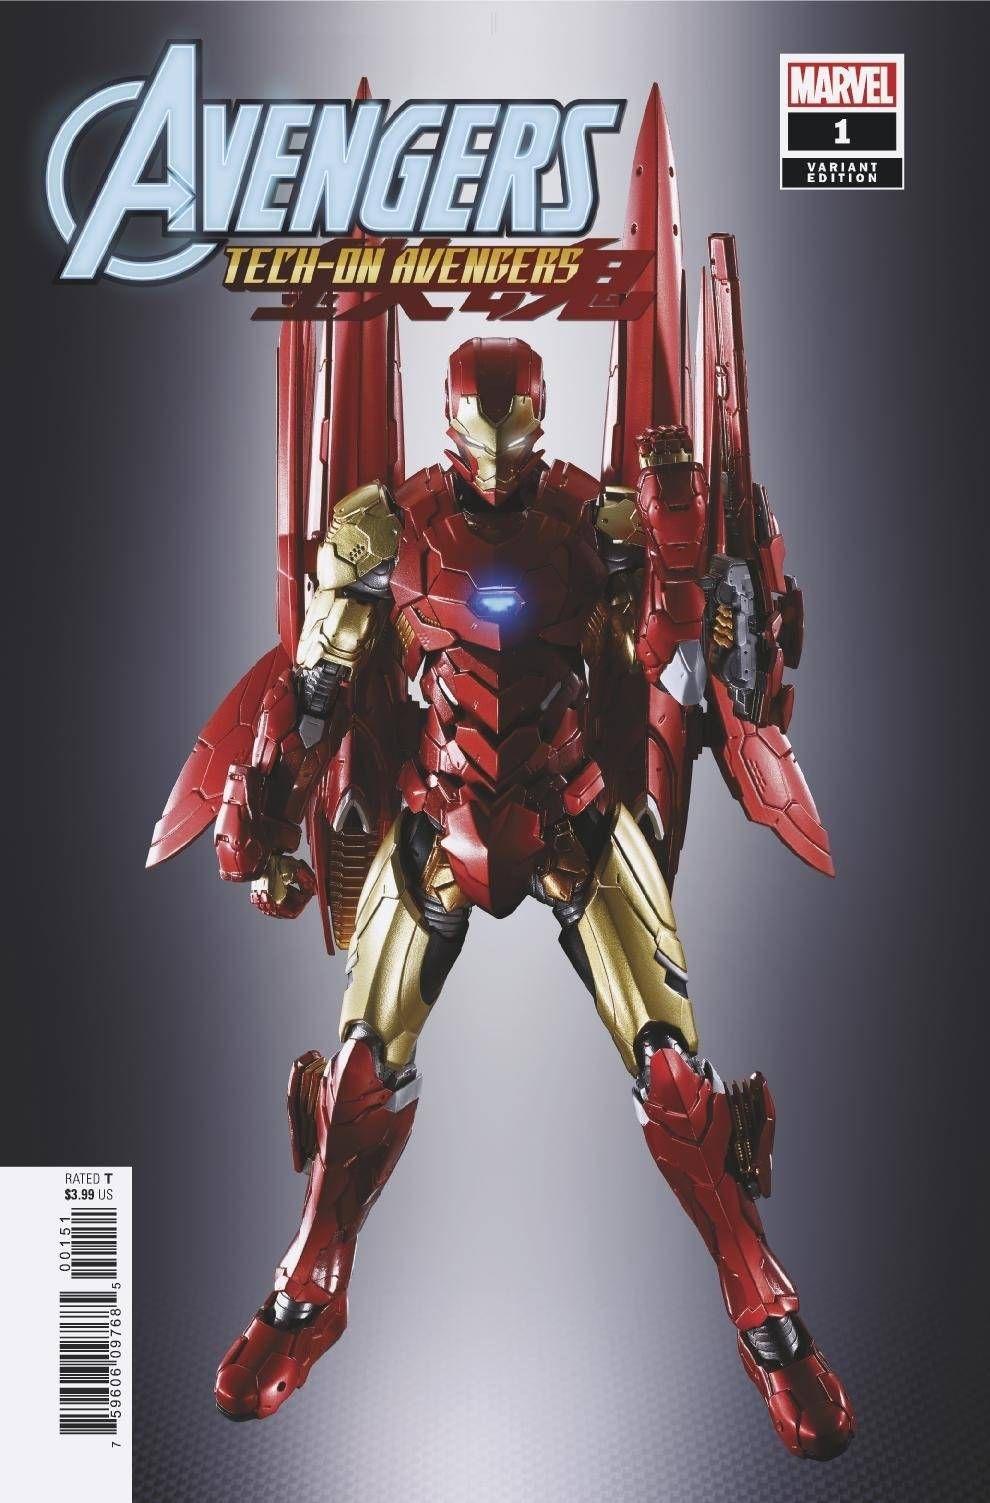 eyJidWNrZXQiOiJnb2NvbGxlY3QuaW1hZ2VzLnB1YiIsImtleSI6ImVjN2Q4YWIxLTZjMjctNDYxMS1iMTIyLTdmNjQ2NjEwZjM2Ni5qcGciLCJlZGl0cyI6W119 ComicList: Marvel Comics New Releases for 08/11/2021